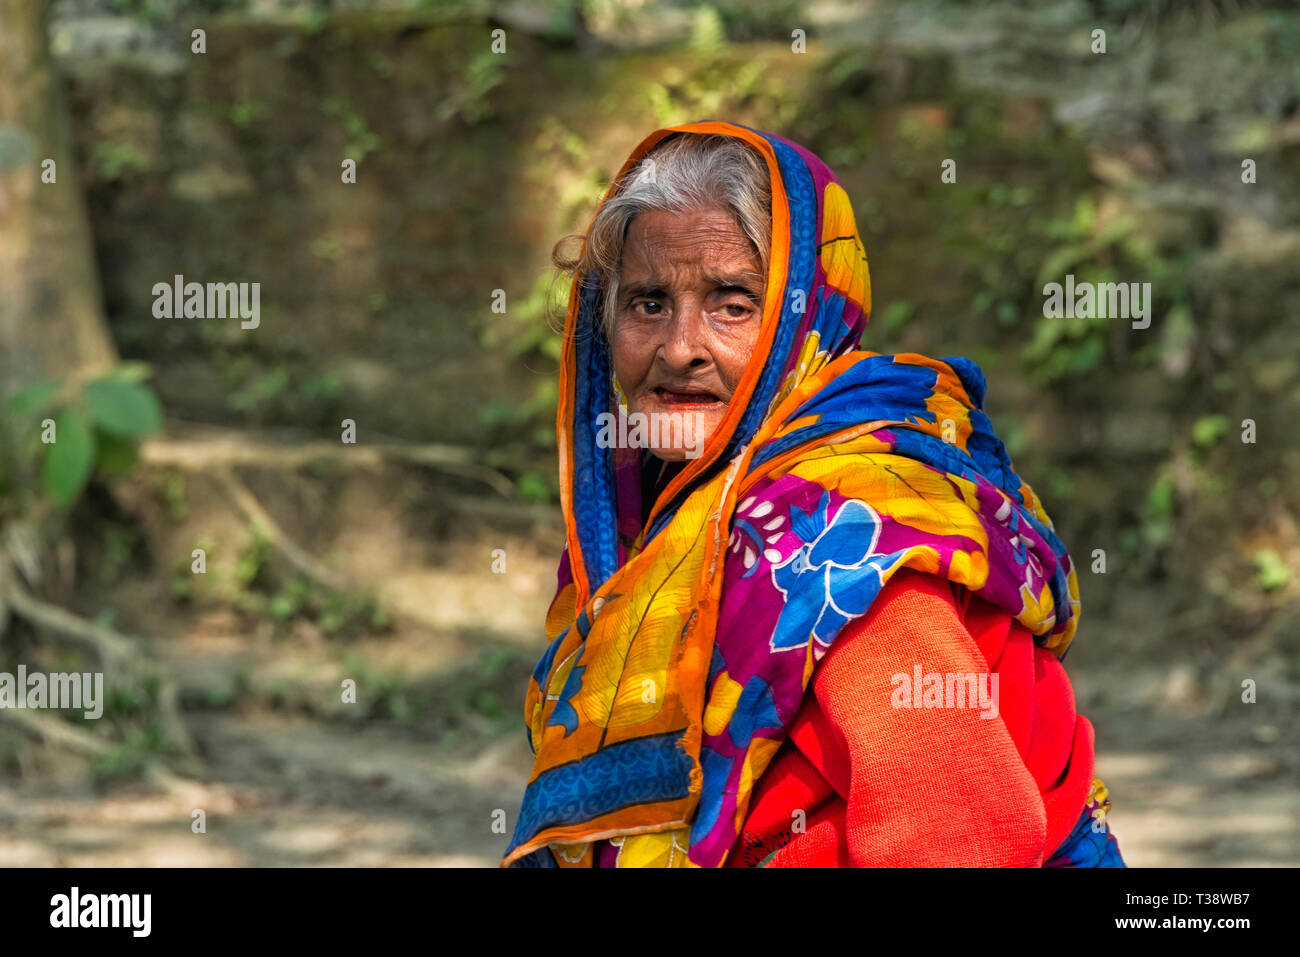 Old woman, Tangail district, Dhaka Division, Bangladesh - Stock Image